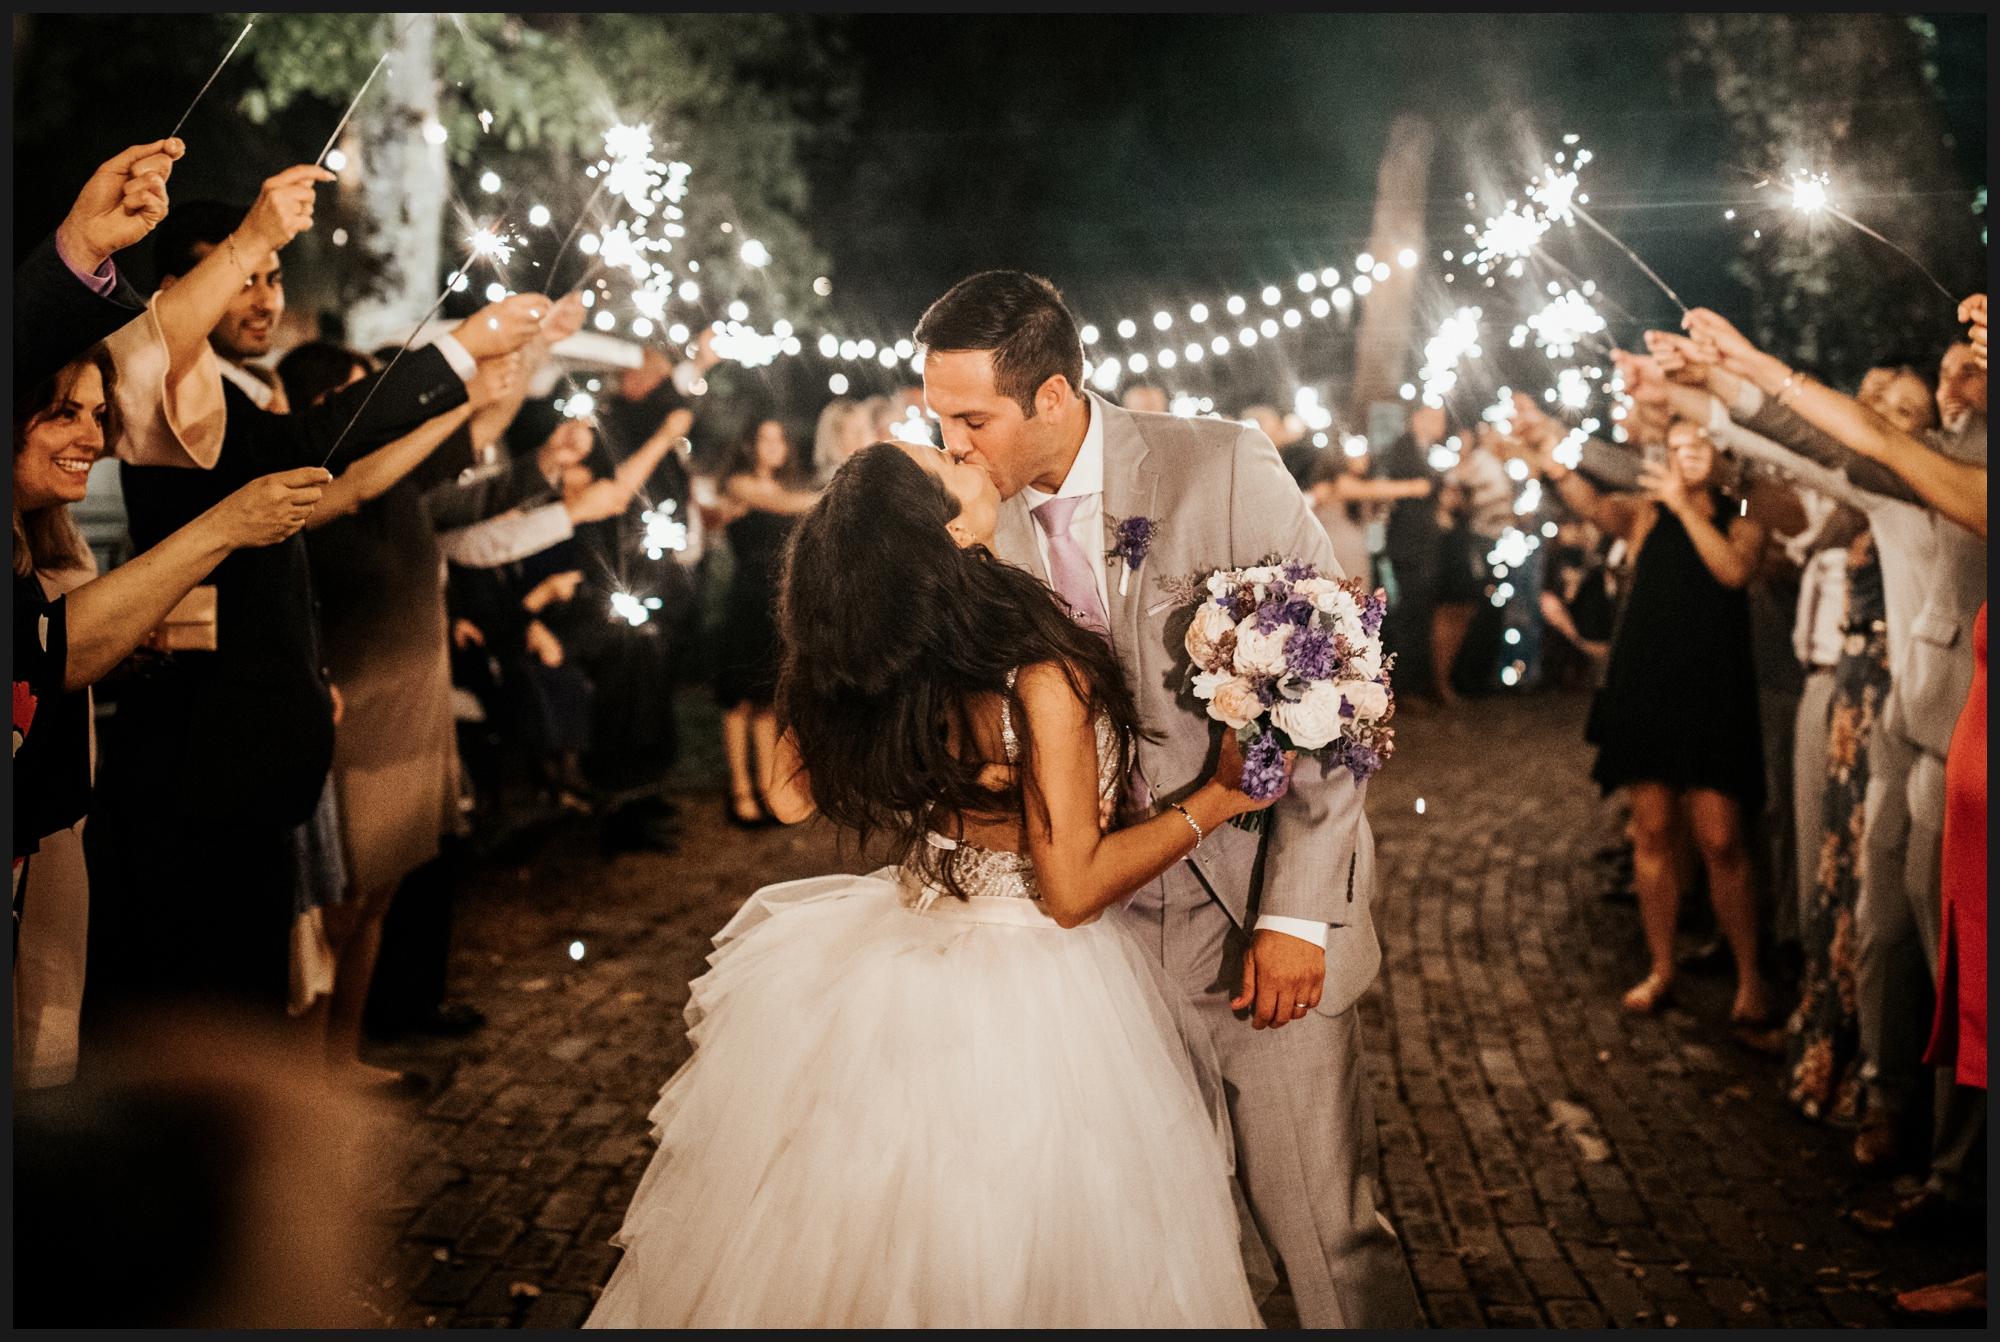 Orlando-Wedding-Photographer-destination-wedding-photographer-florida-wedding-photographer-bohemian-wedding-photographer_1652.jpg